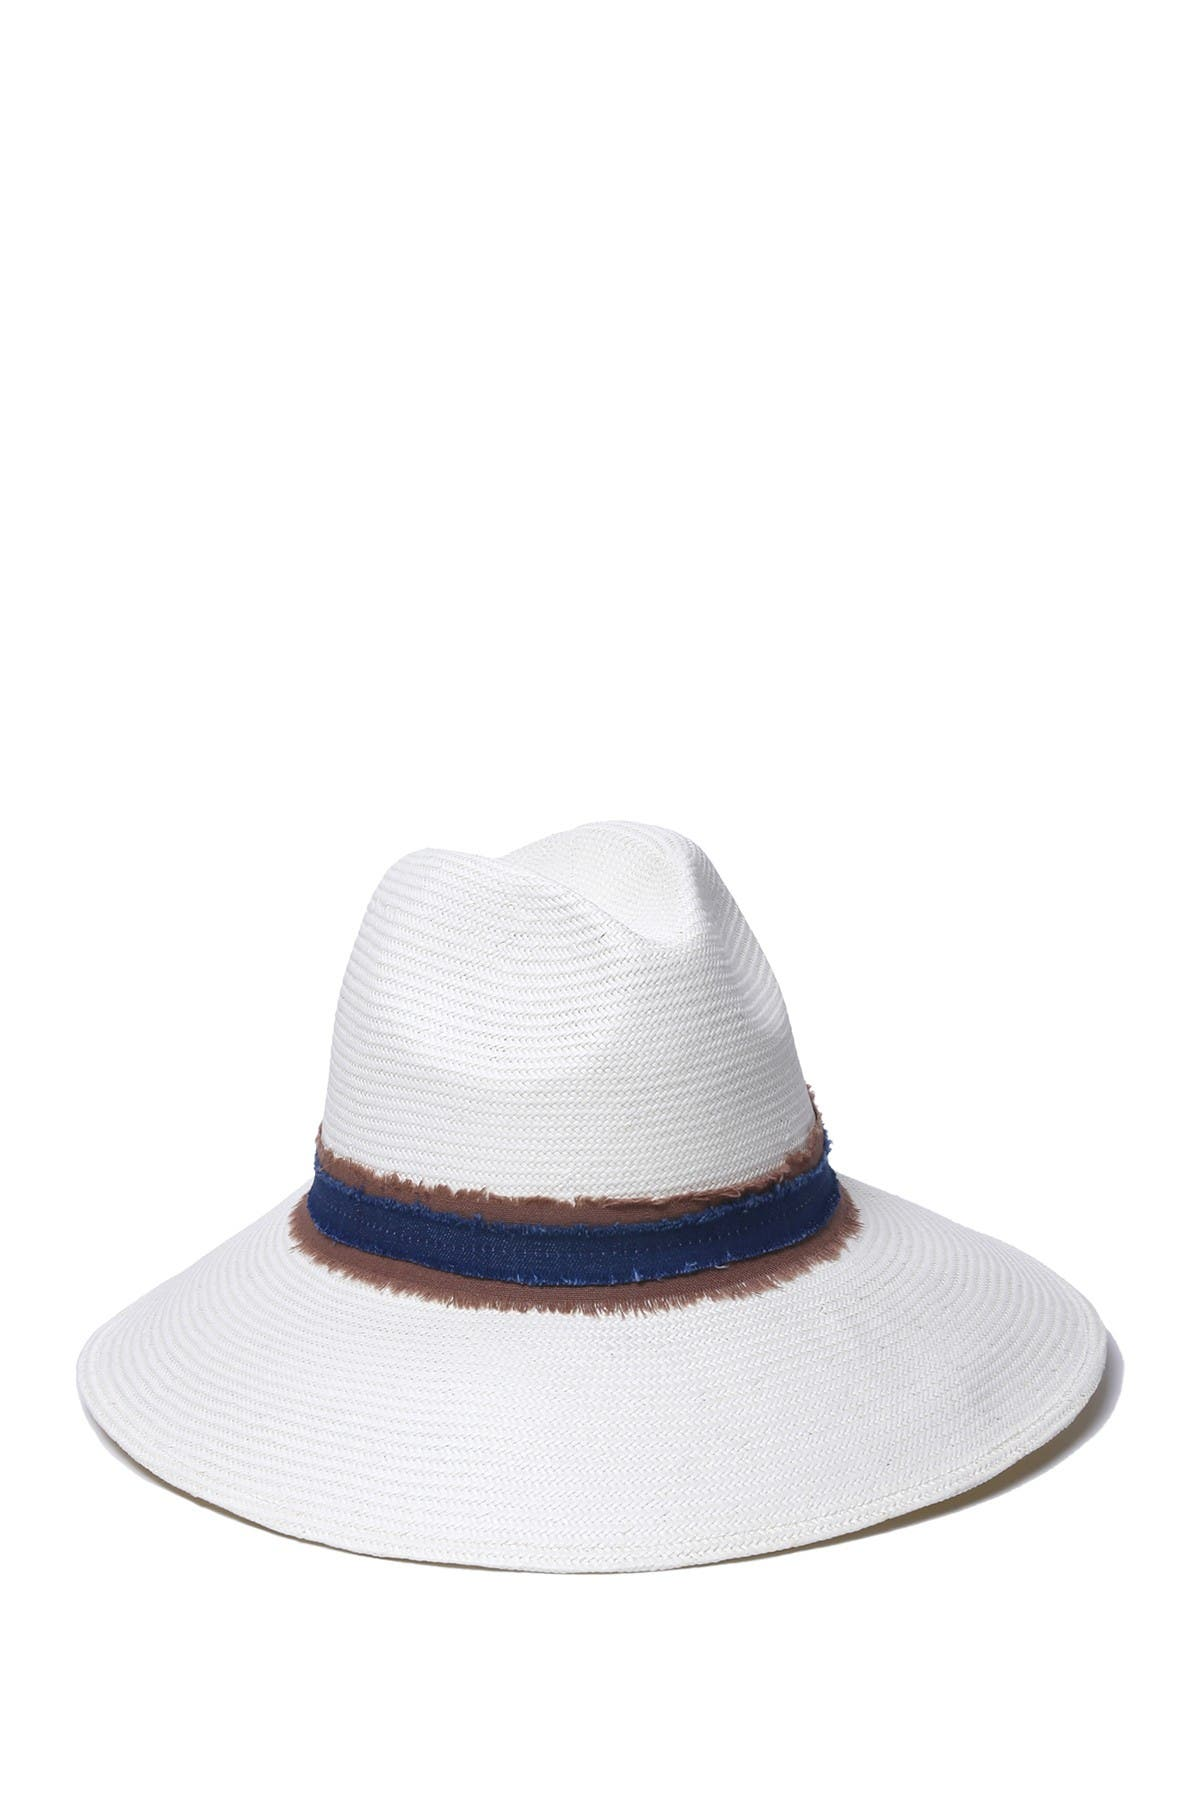 Image of Physician Endorsed Grosvenor UPF 50+ Panama Hat